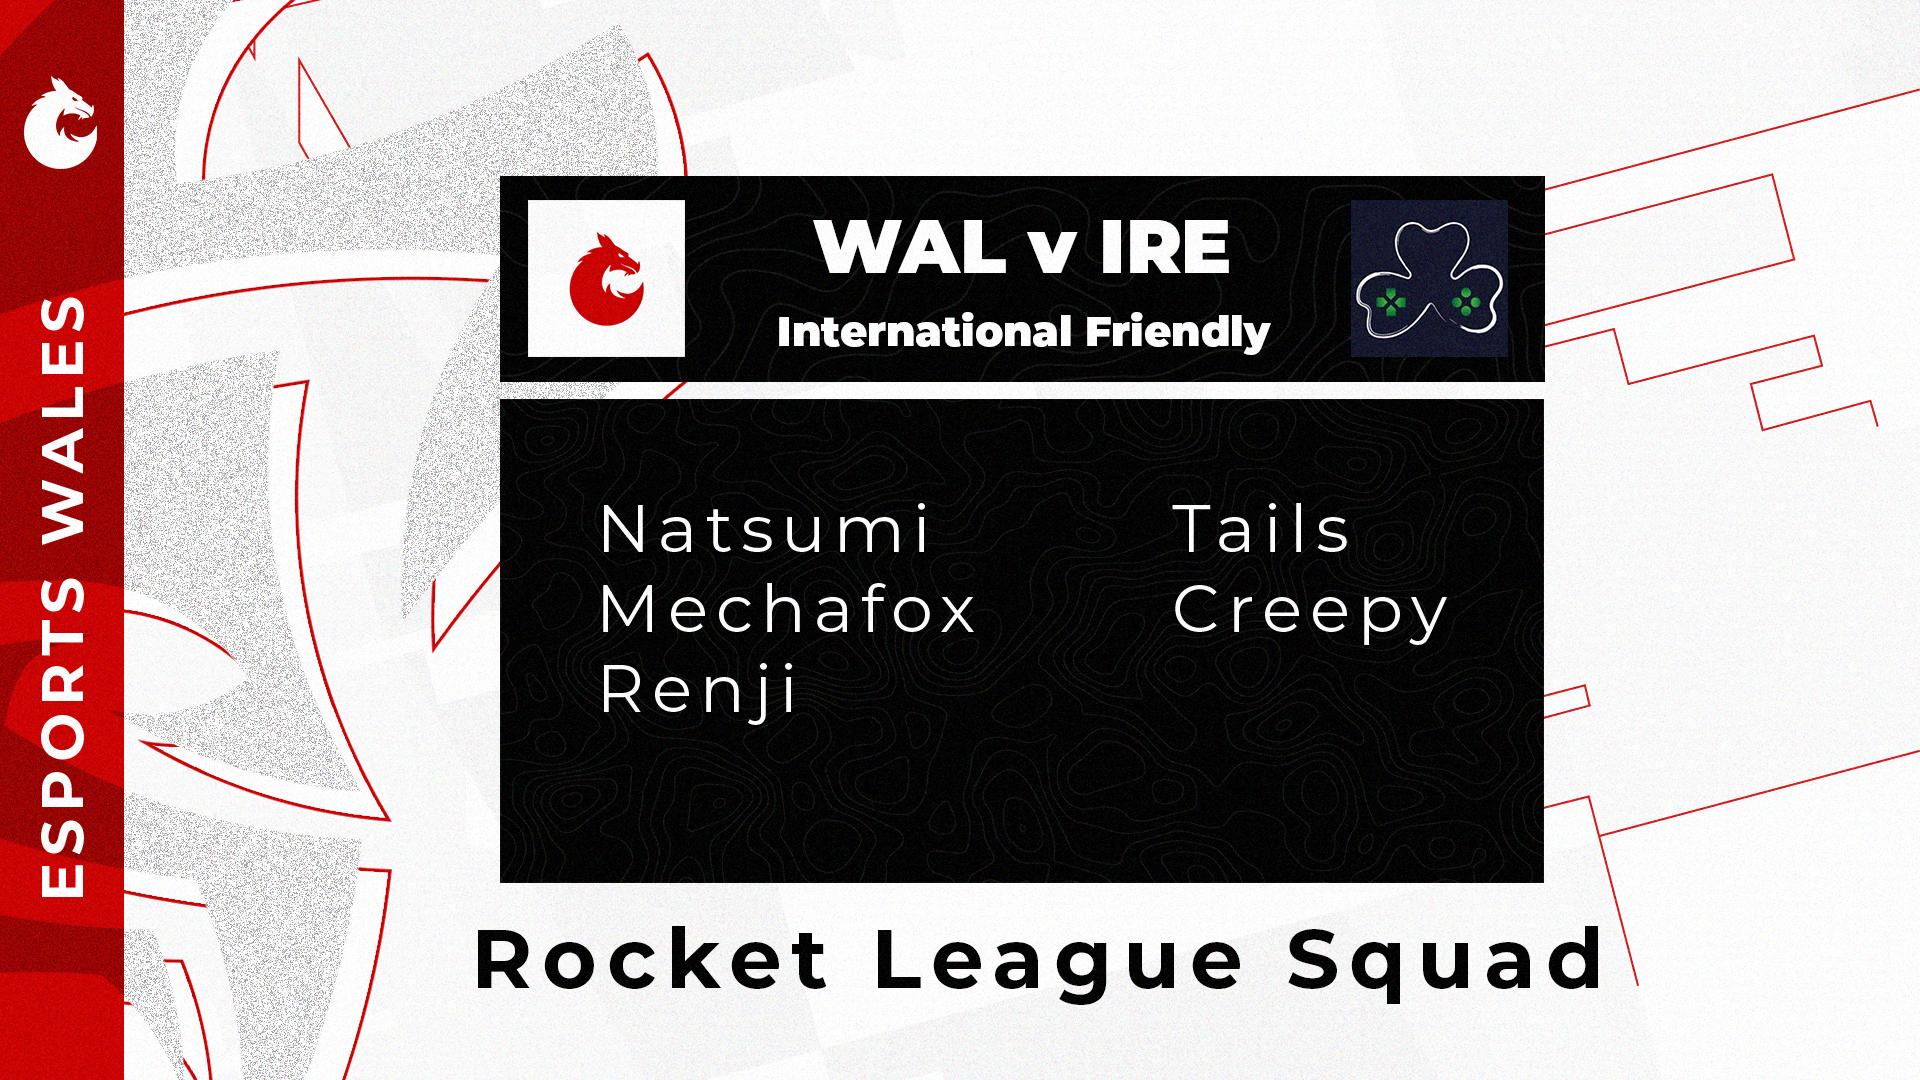 Wales vs Ireland – Rocket League Squad